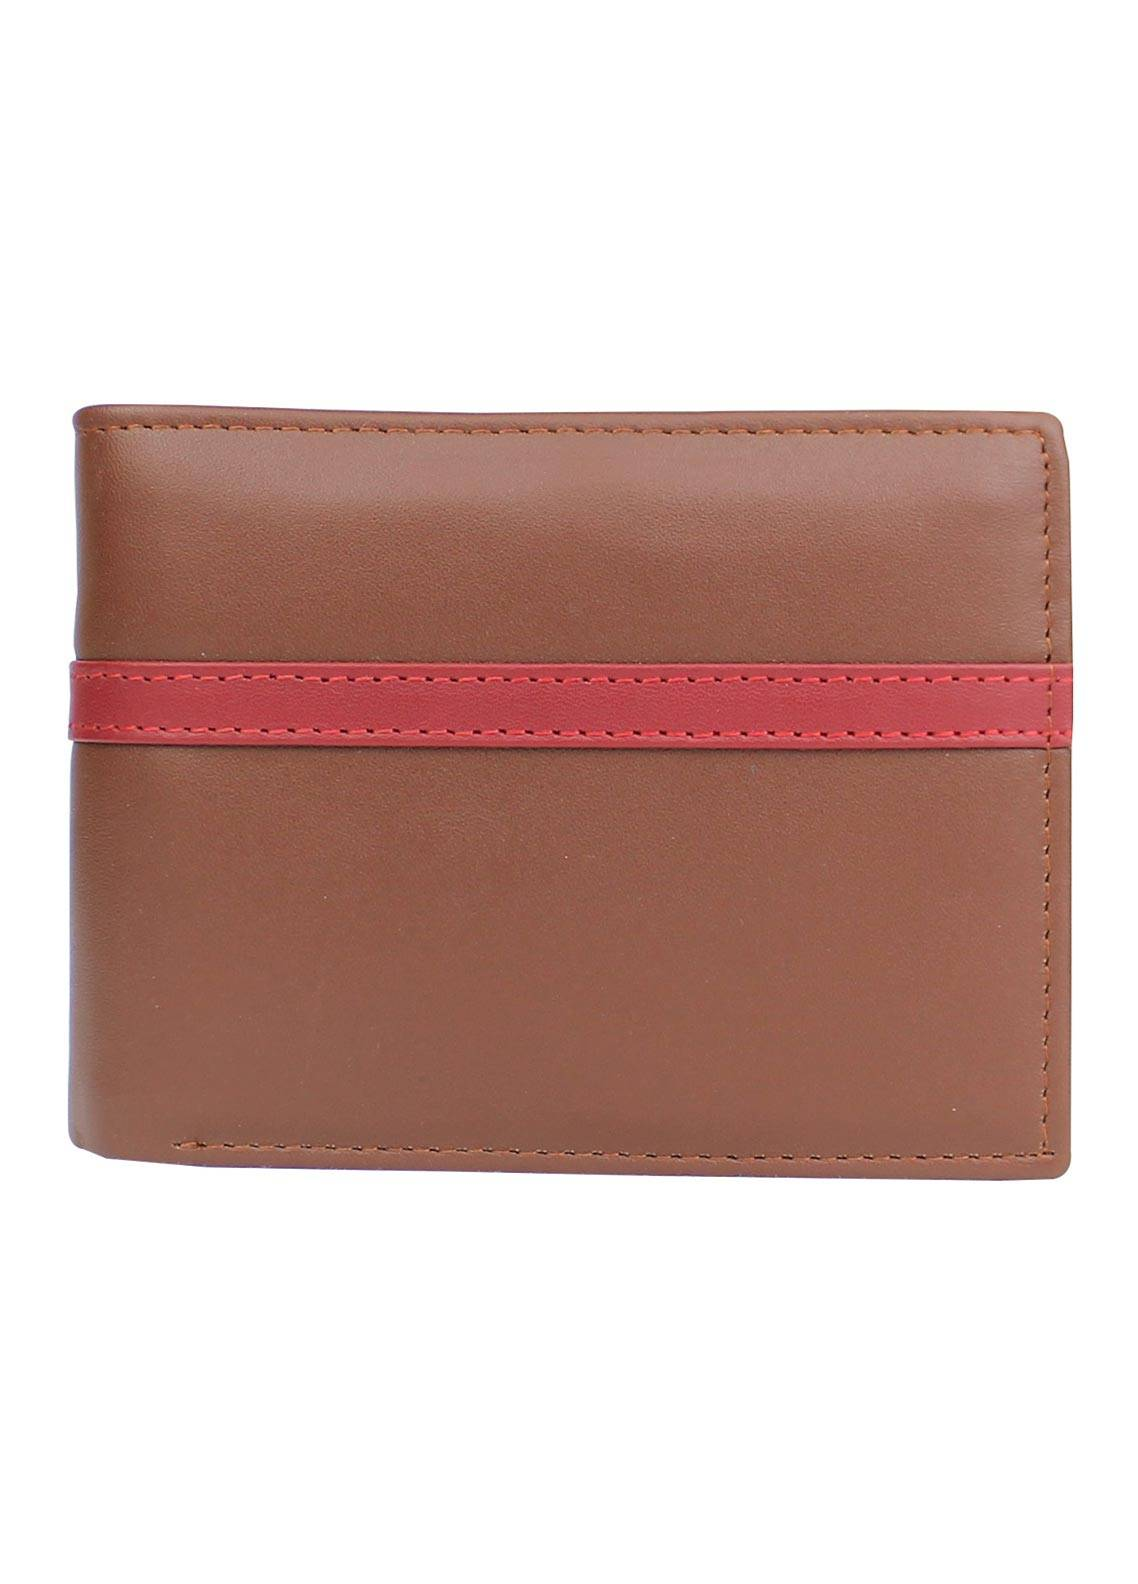 Shahzeb Saeed Plain Texture Leather Wallet W-081 - Men's Accessories